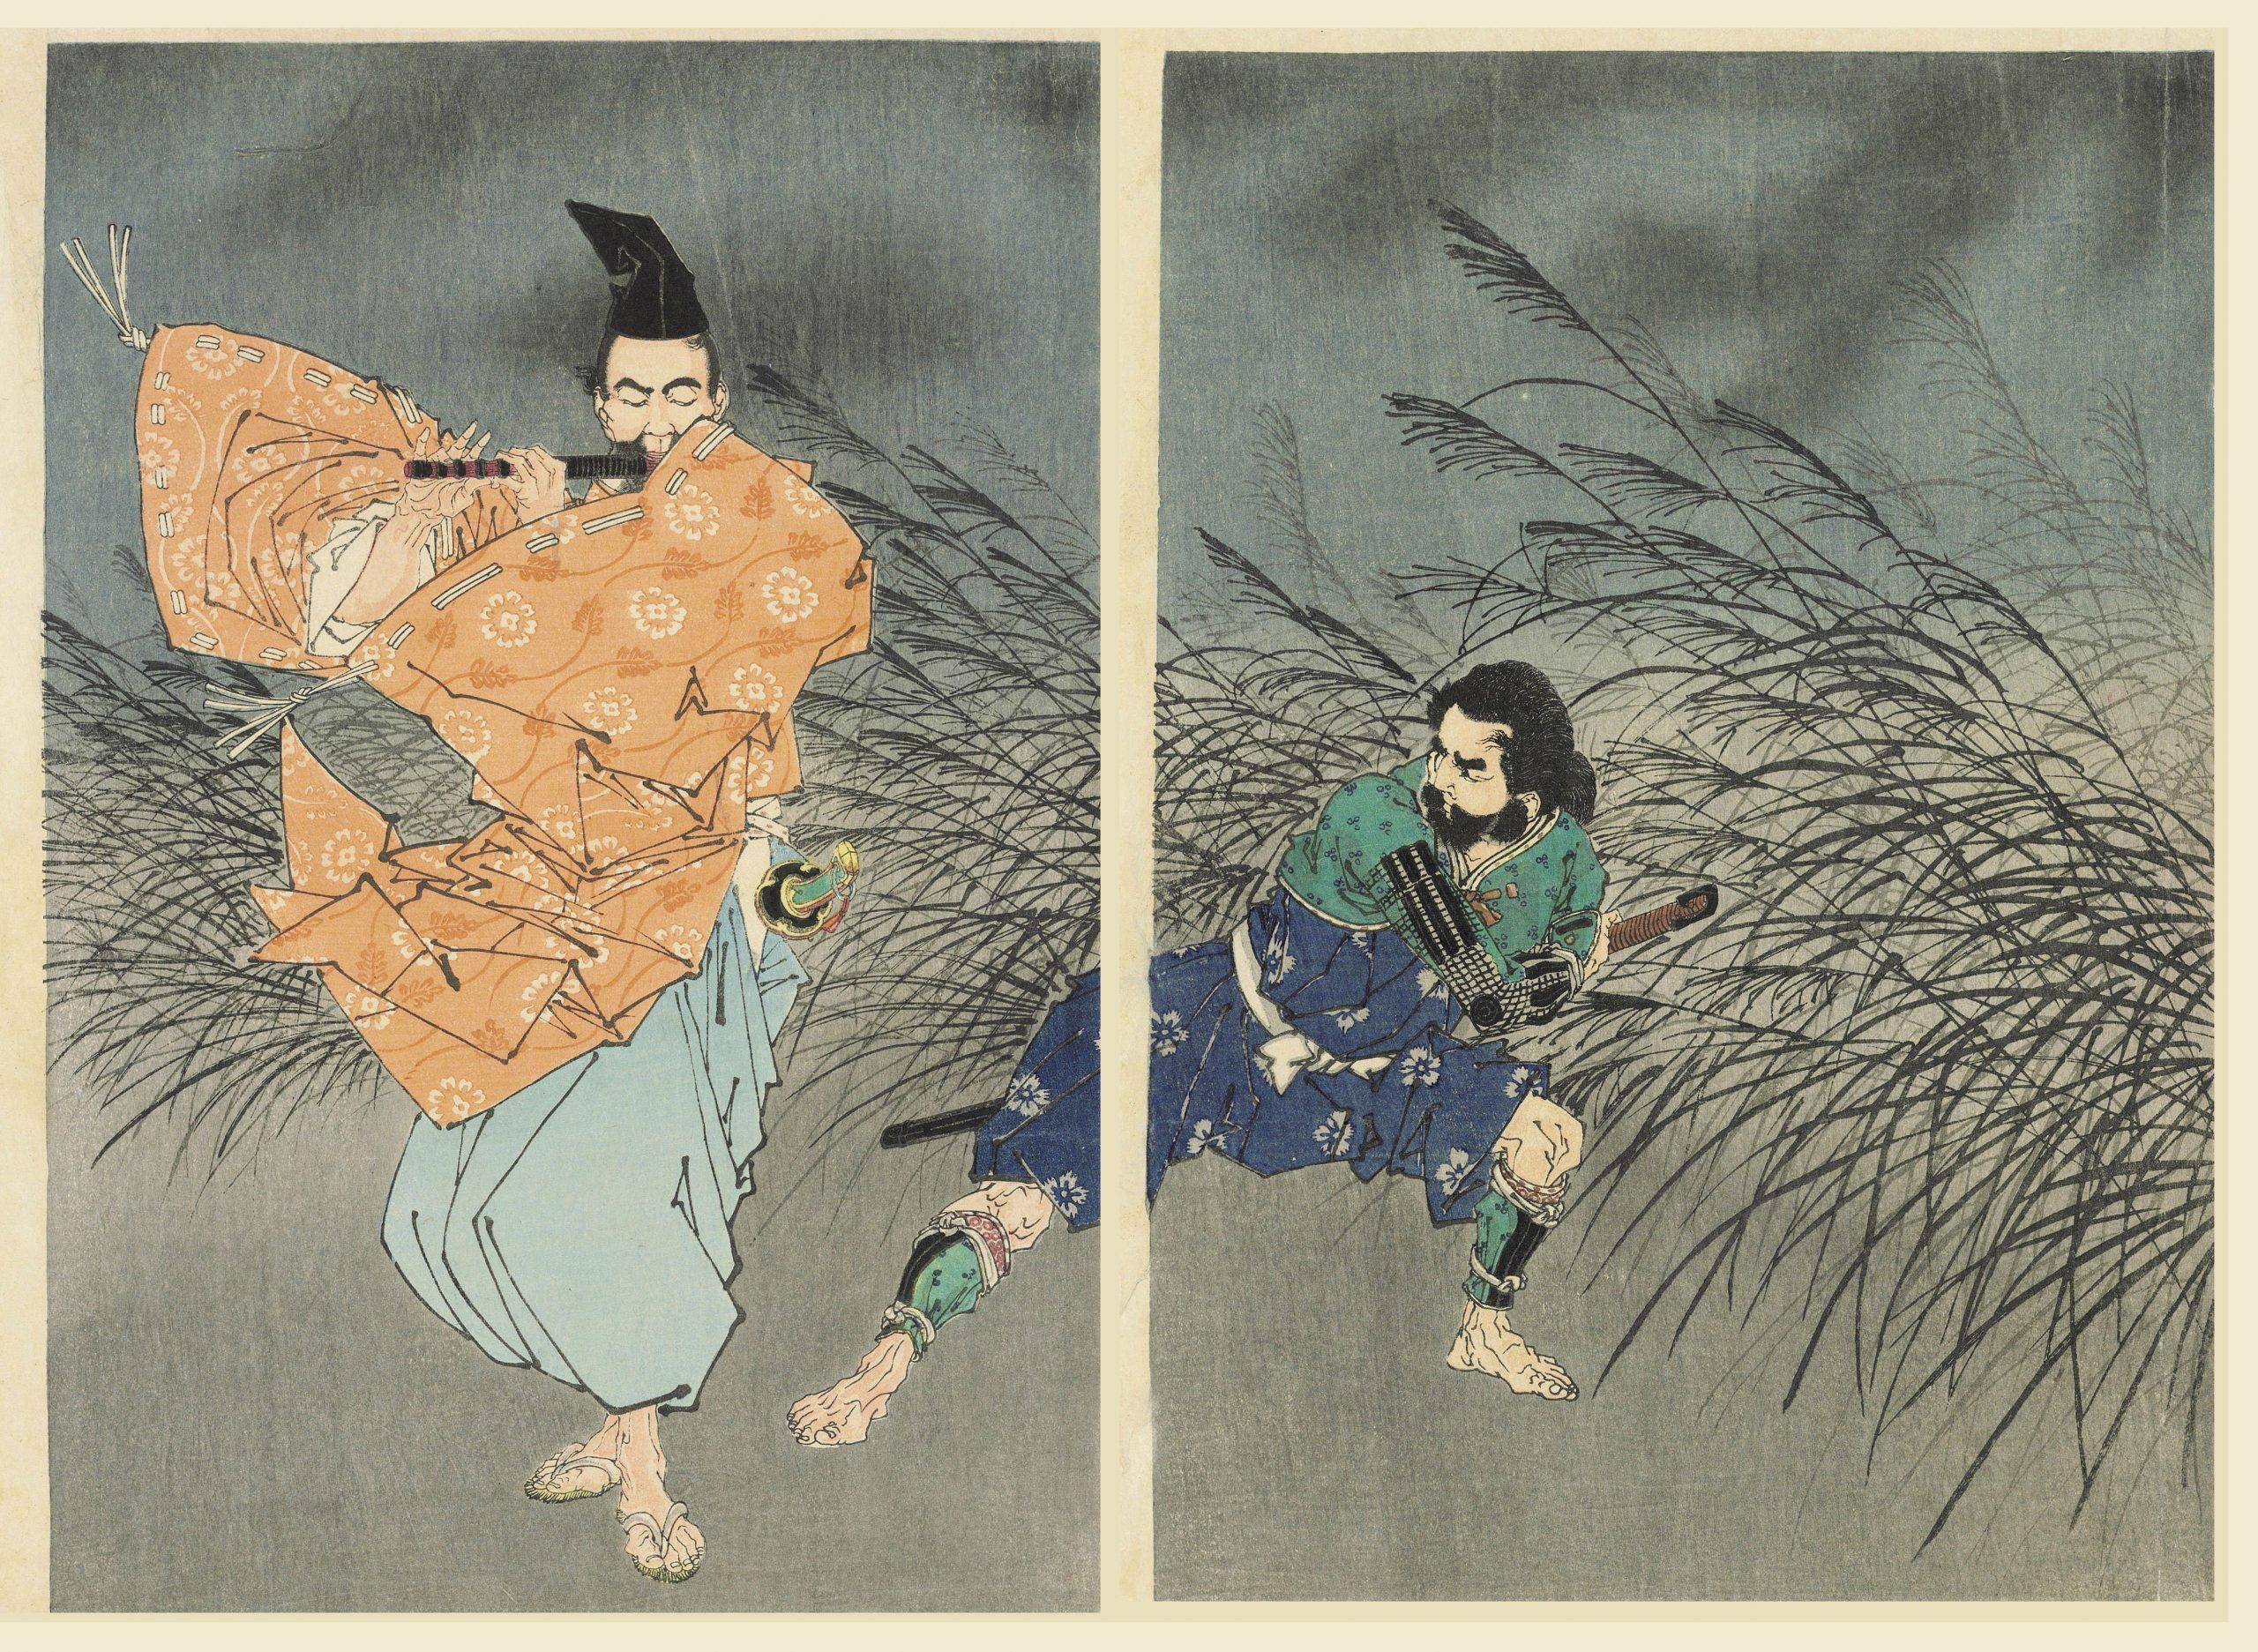 Fujiwara Yasumasa joue de la flûte au clair de lune